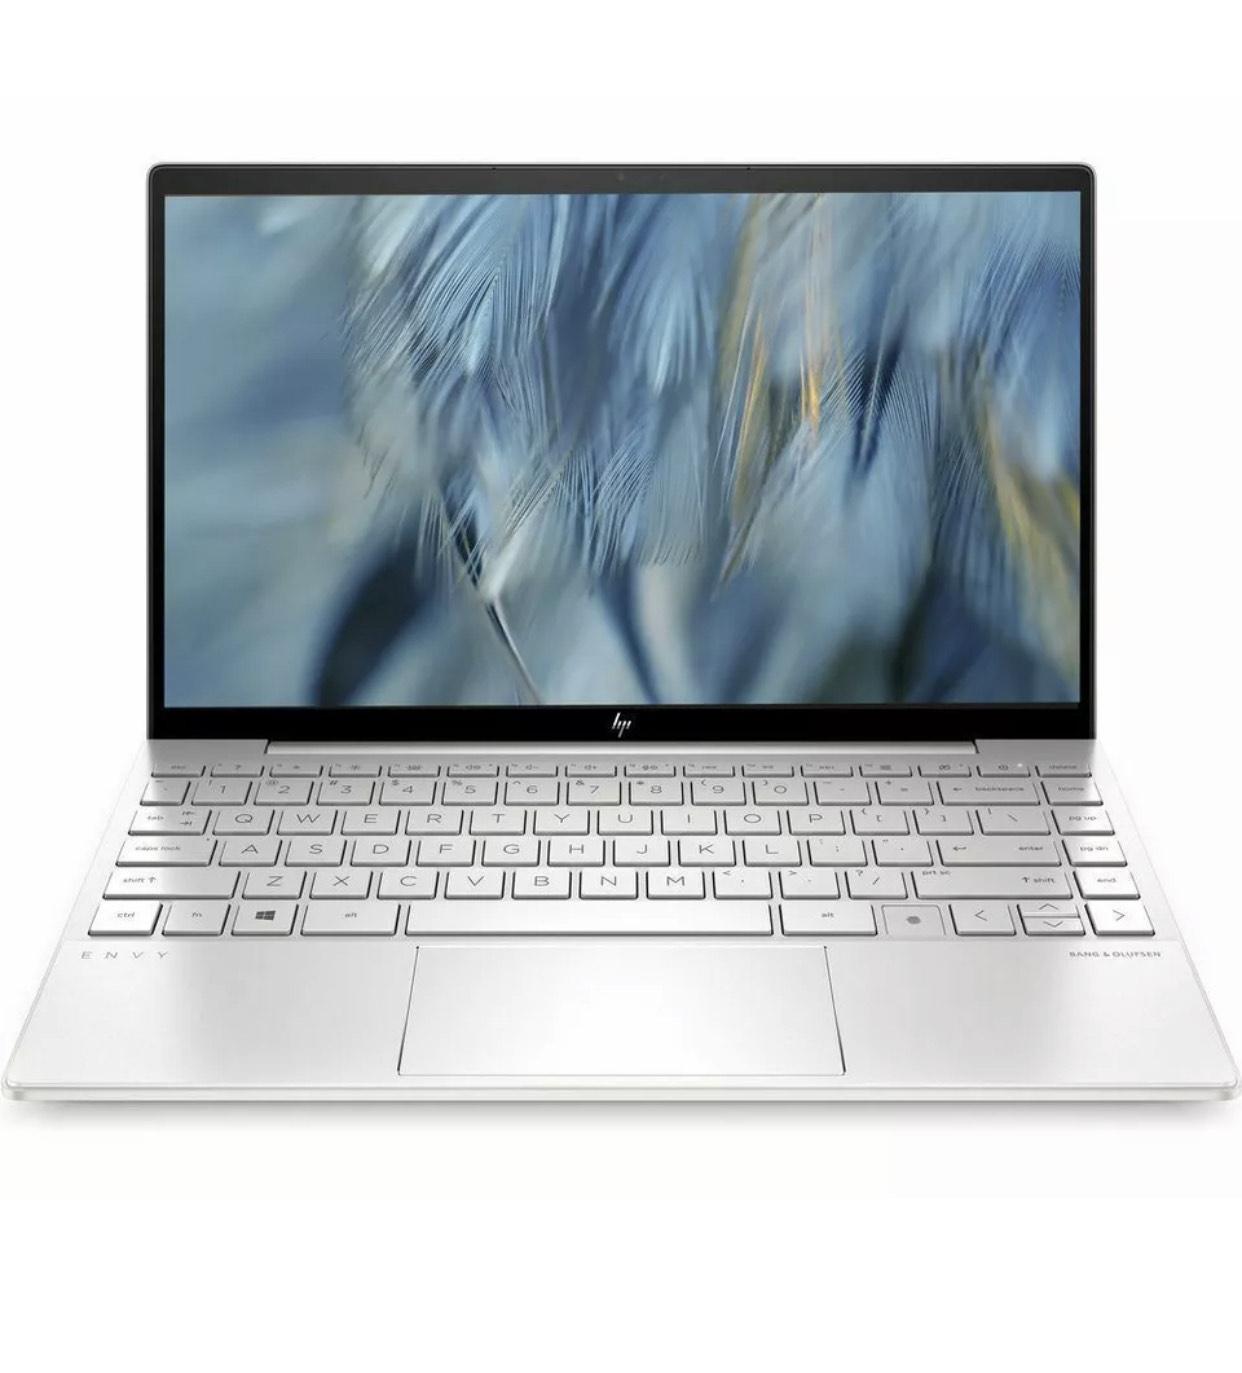 "Refurbished HP ENVY 13-ba1565sa 13.3"" Laptop - Intel® Core™ i7, 1 TB SSD, Silver - REFURB-A (UK Mainland) @ Currys_clearance eBay"